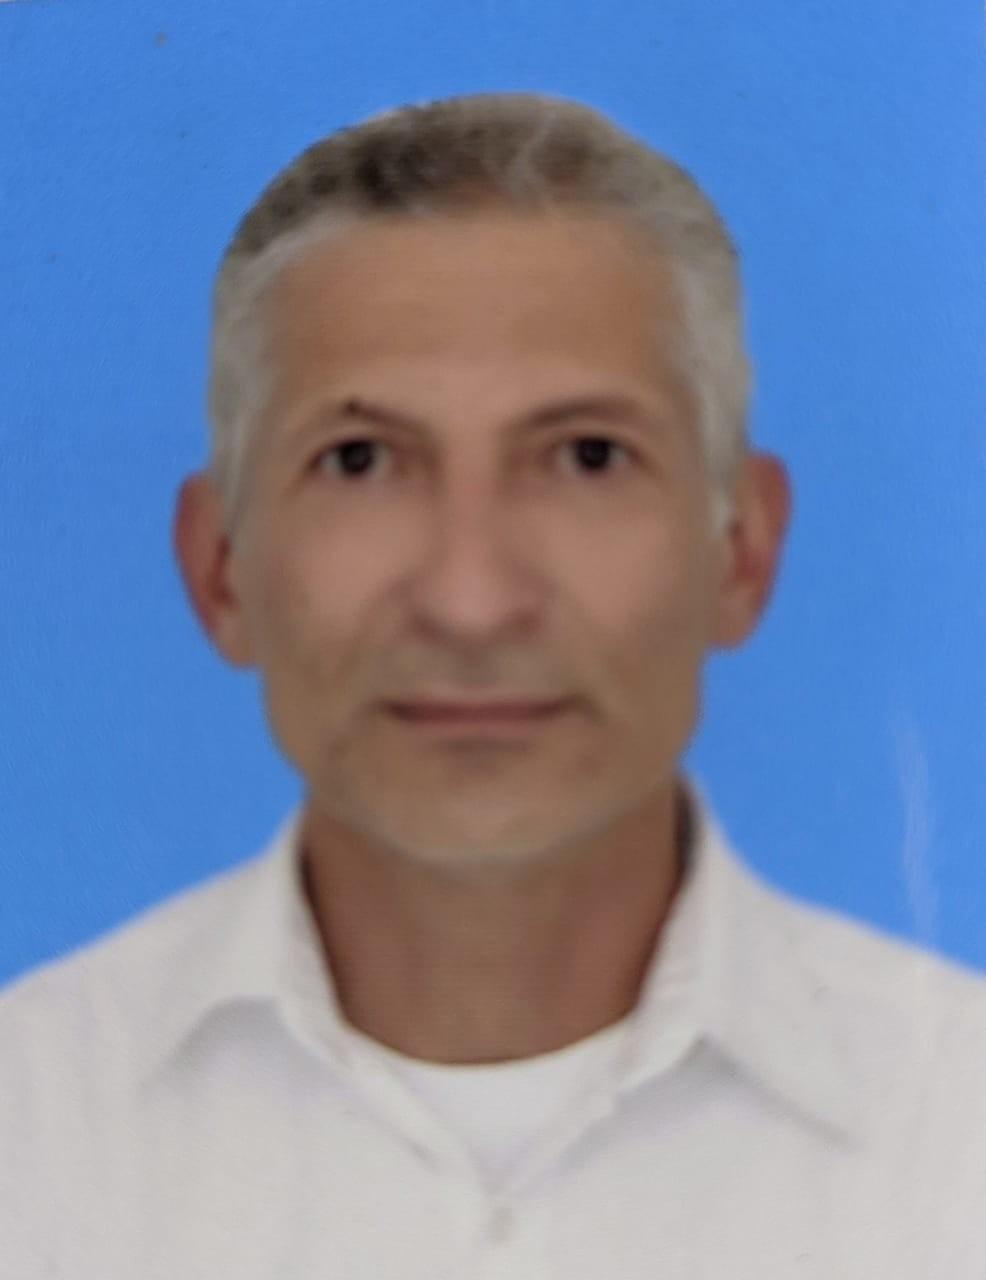 Jorge Diego Sierra Arroyave